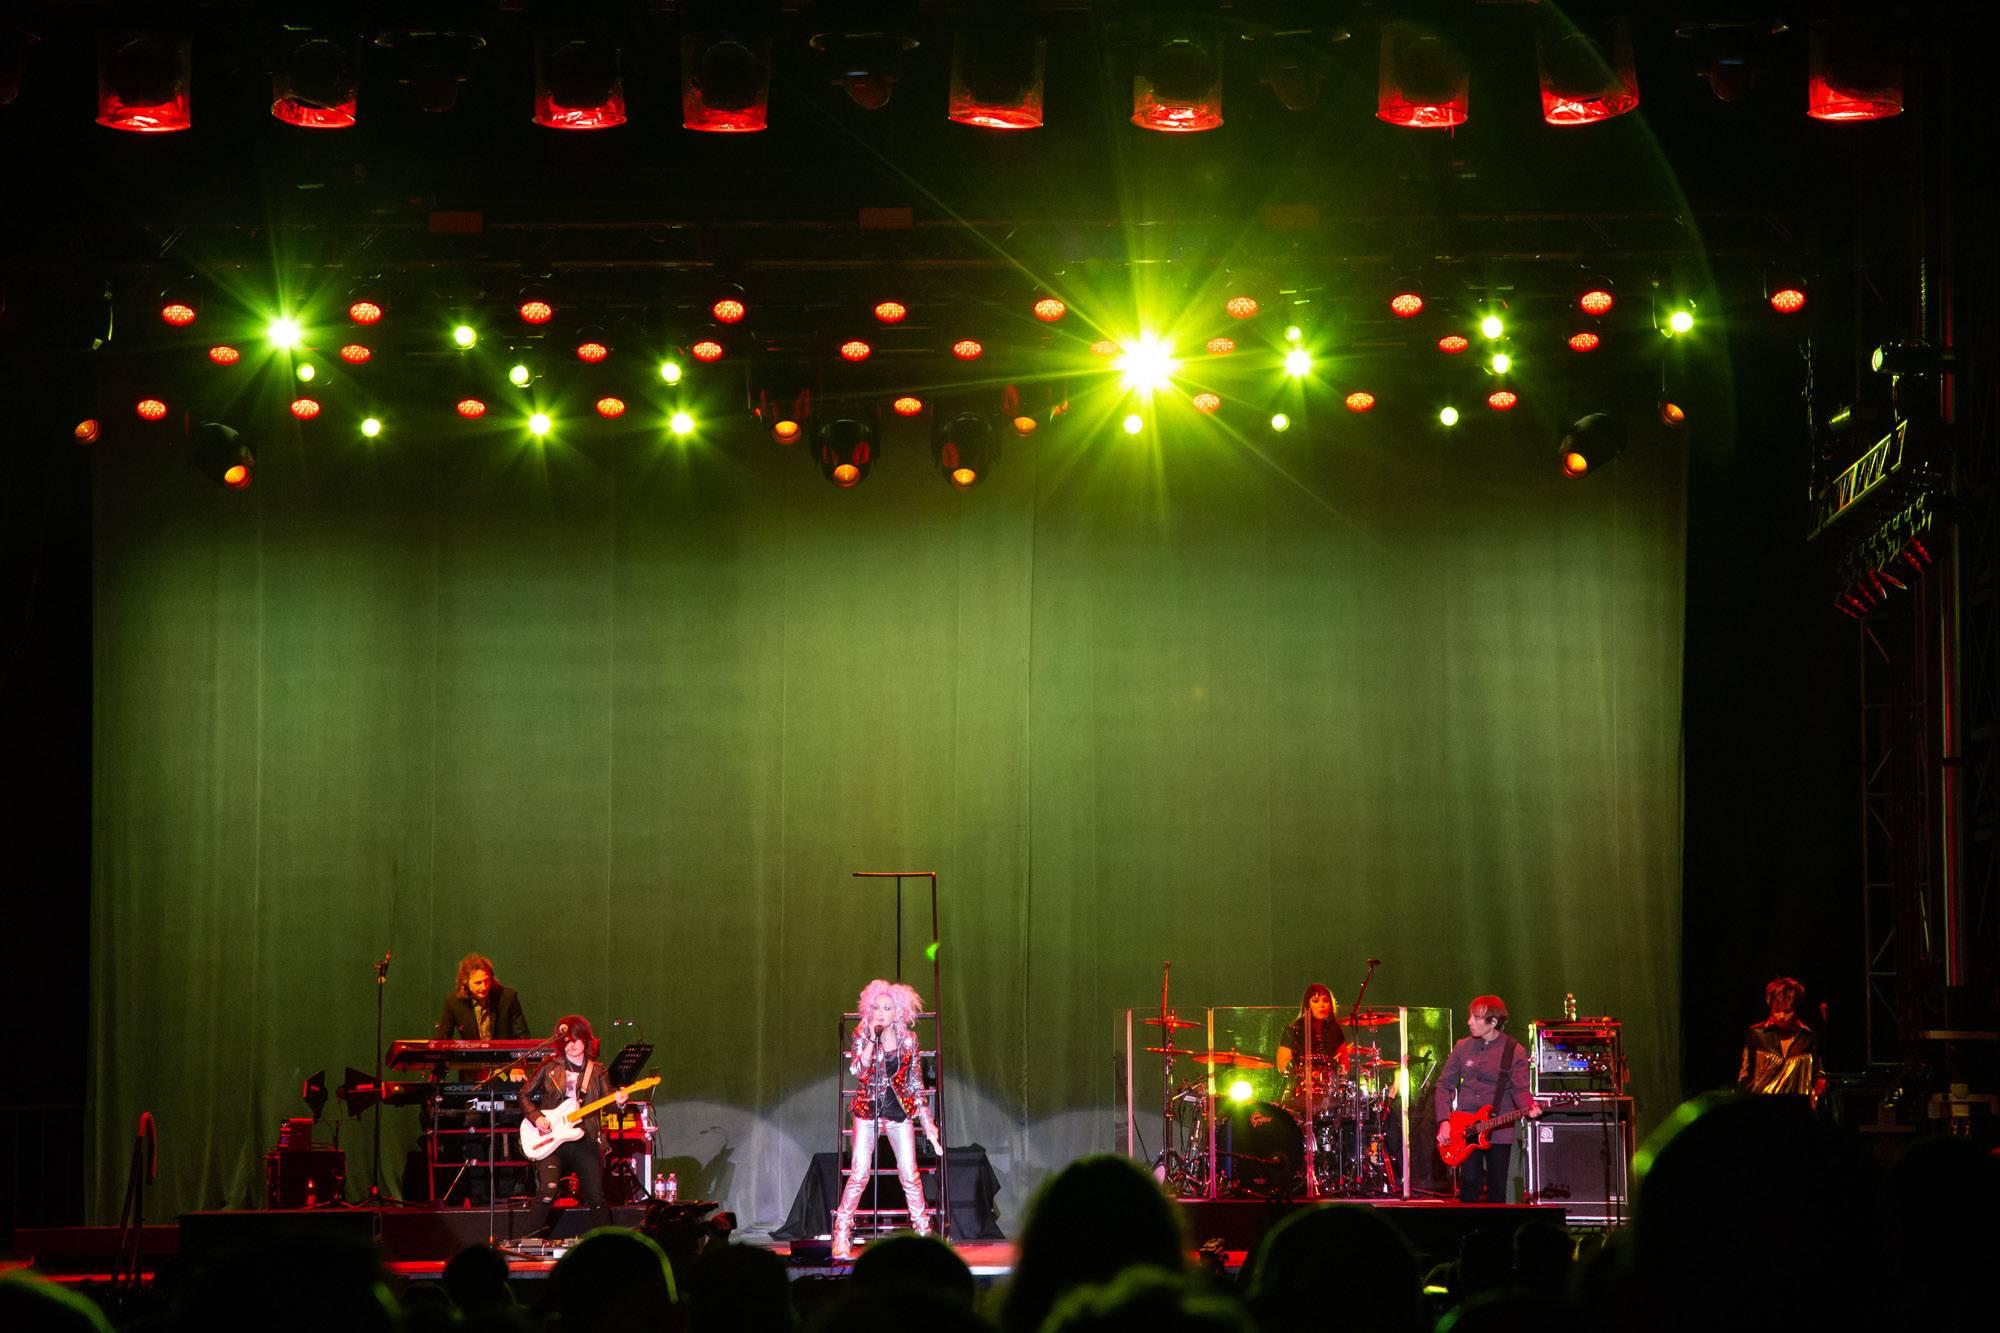 Cyndi Lauper at the PNE Amphitheatre, Vancouver, Sep 3 2018. Kirk Chantraine photo.